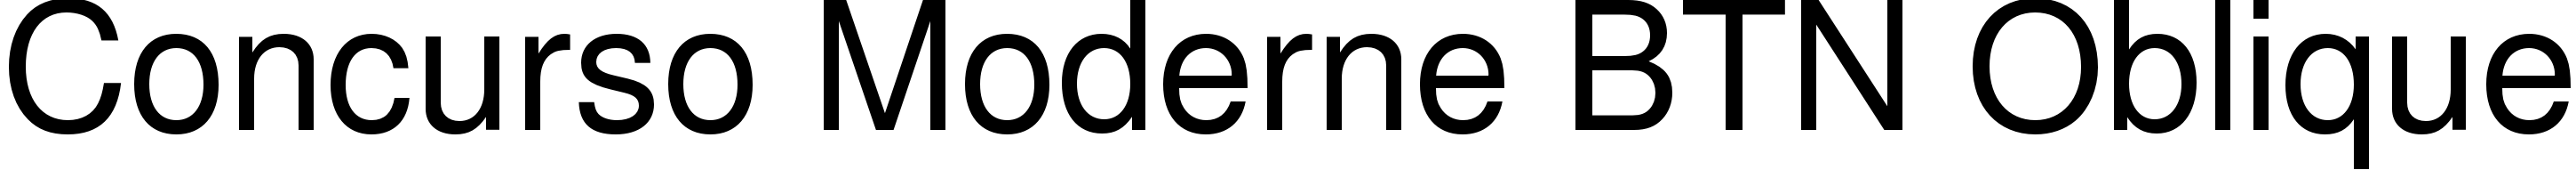 Concurso Moderne BTN Oblique